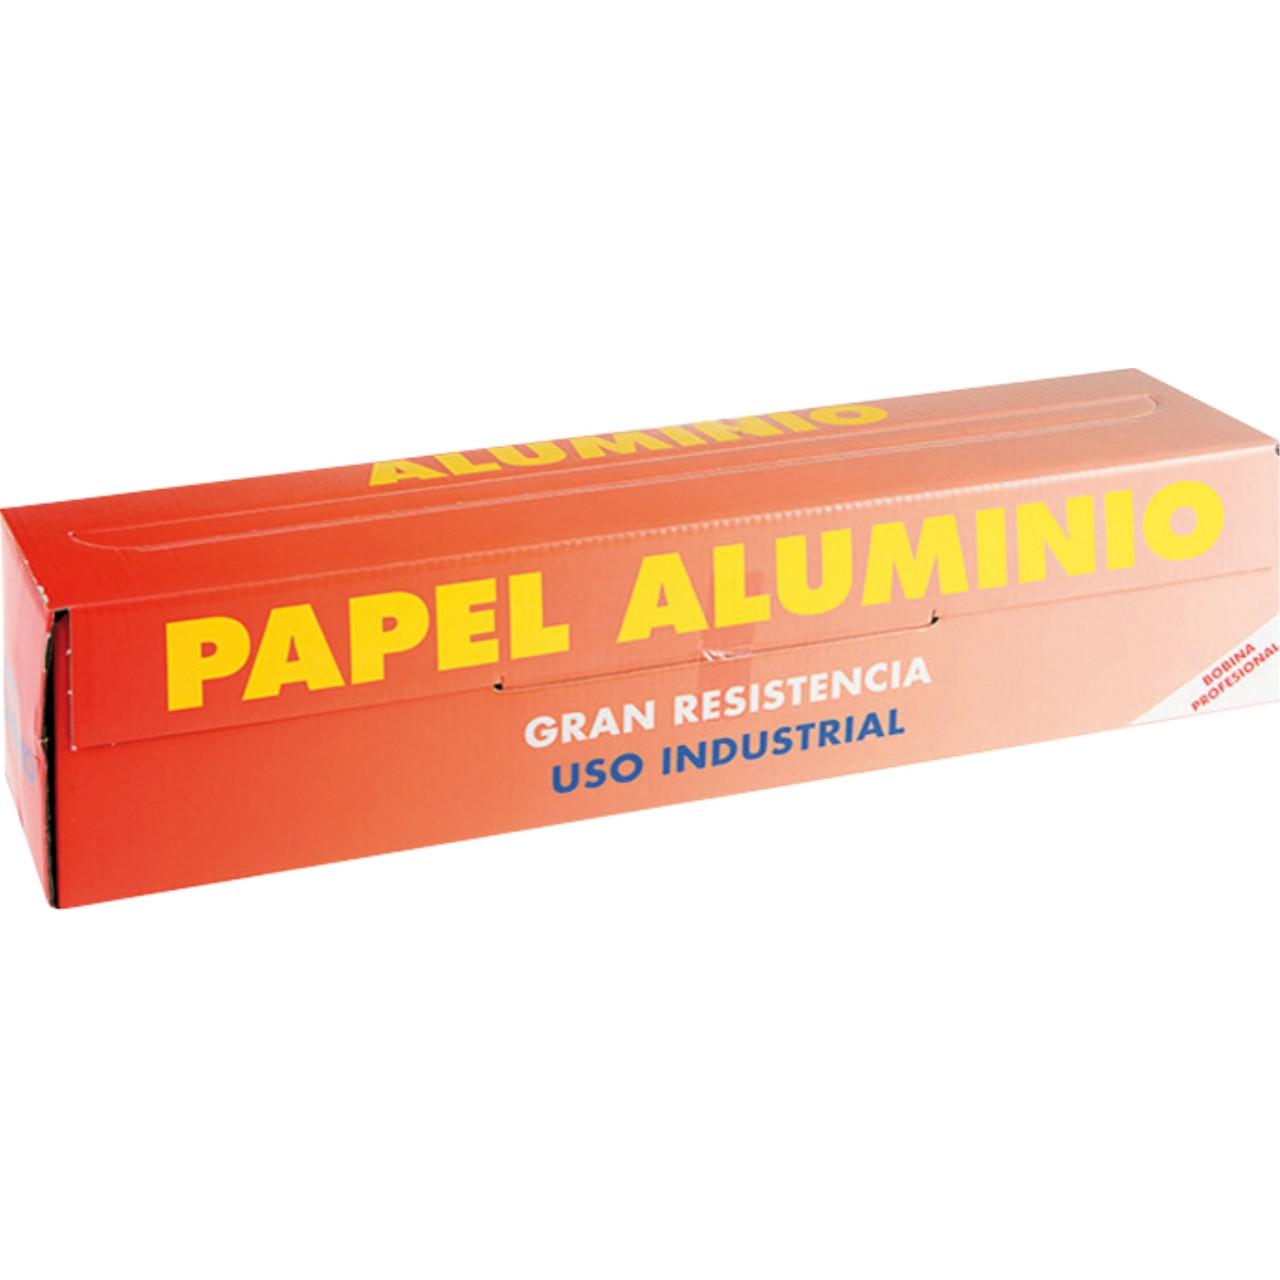 Alumini 11 micres 40x200